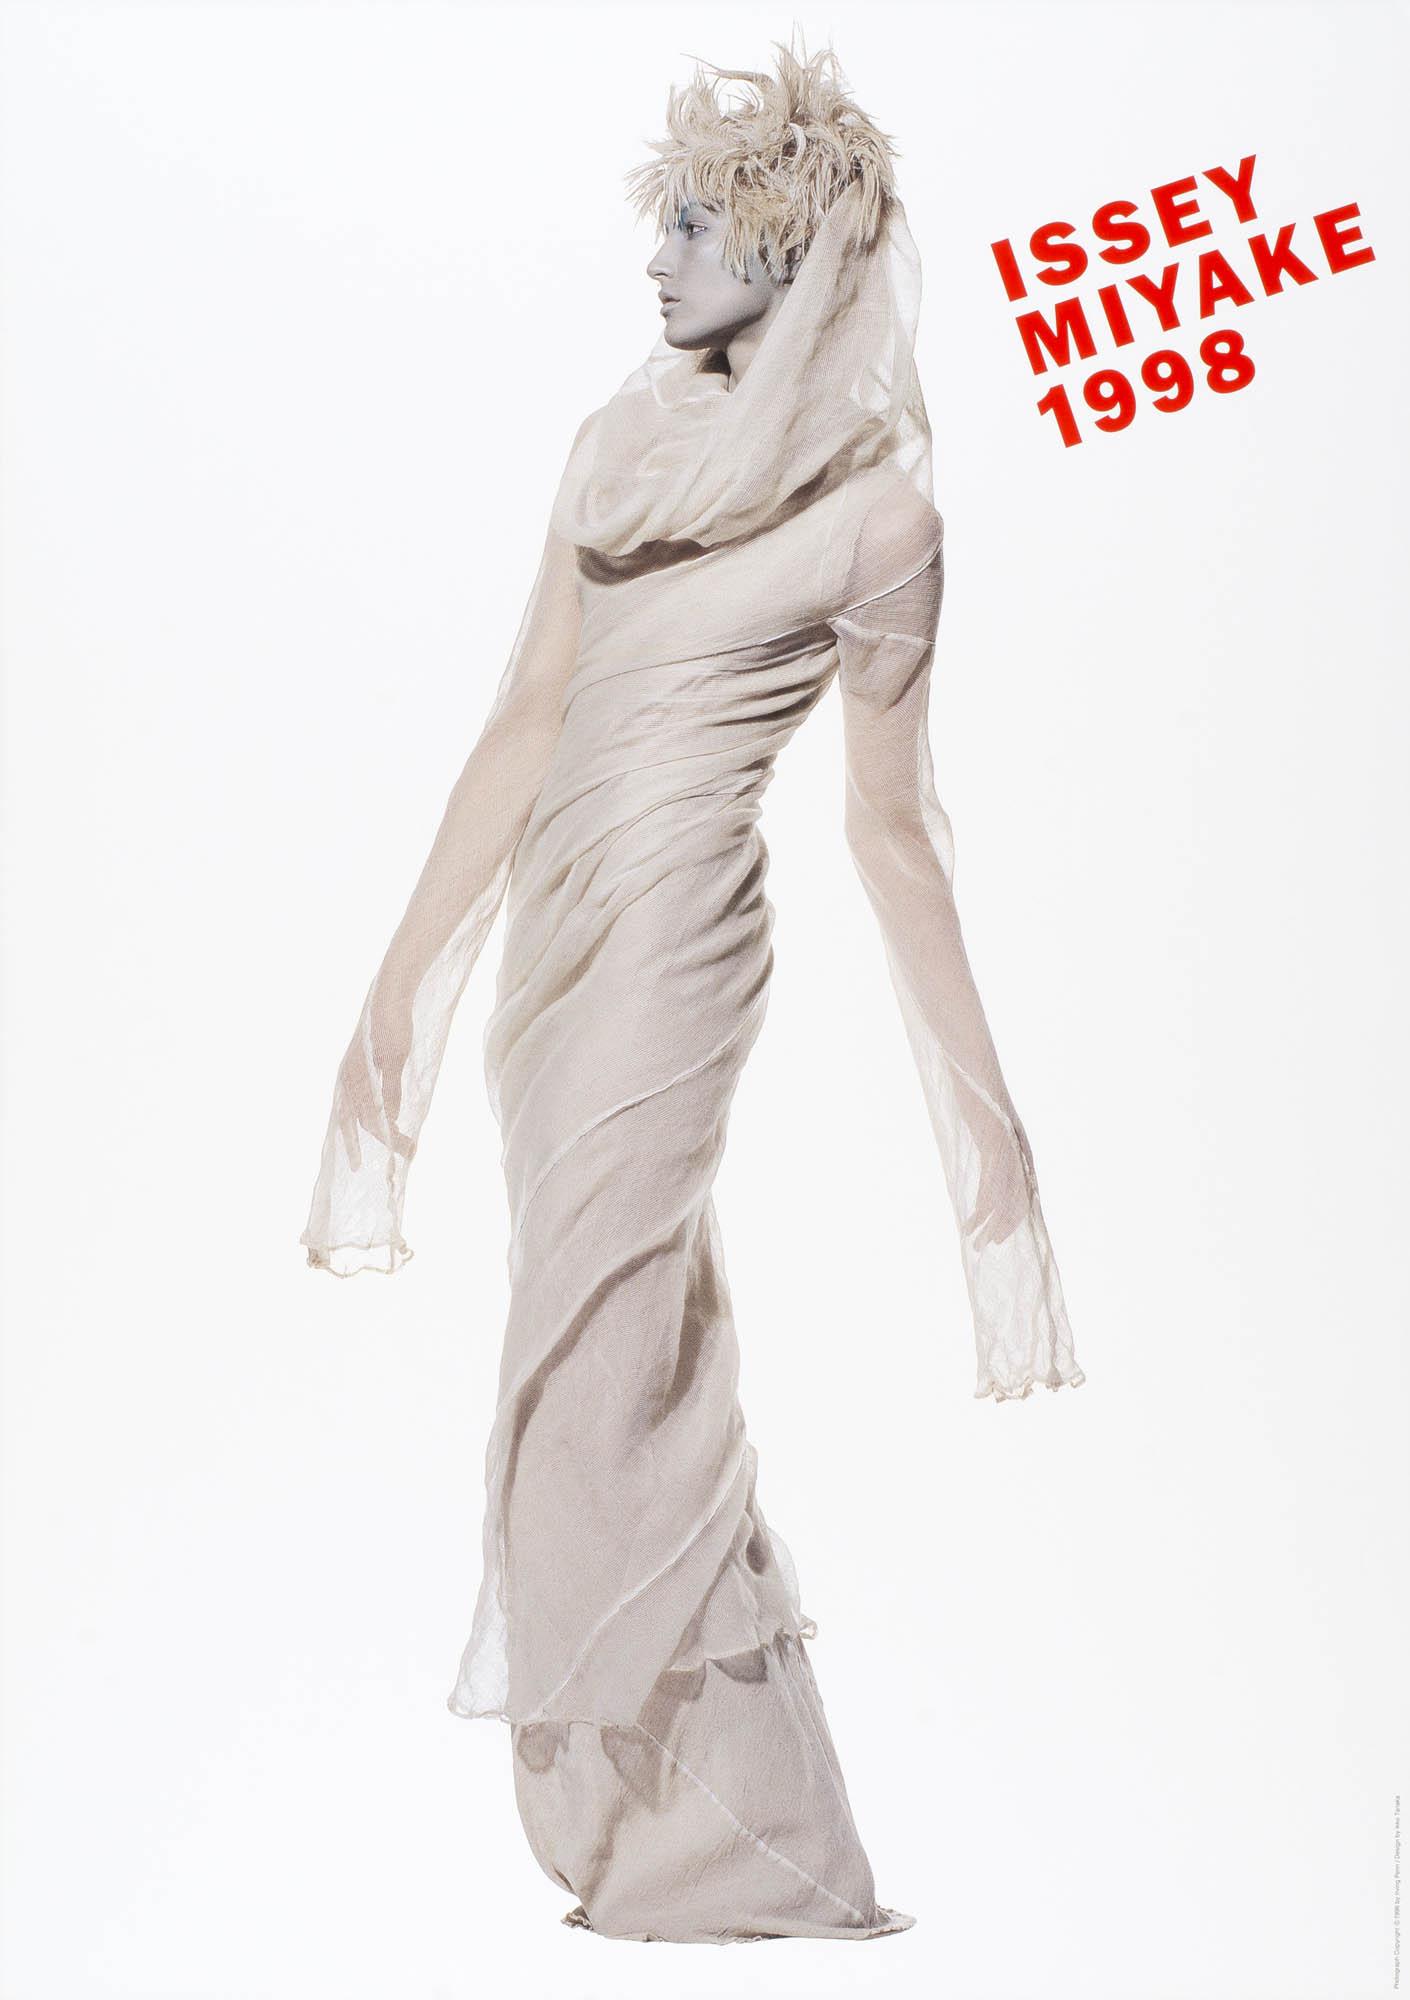 (untitled) Issey Miyake Kimono